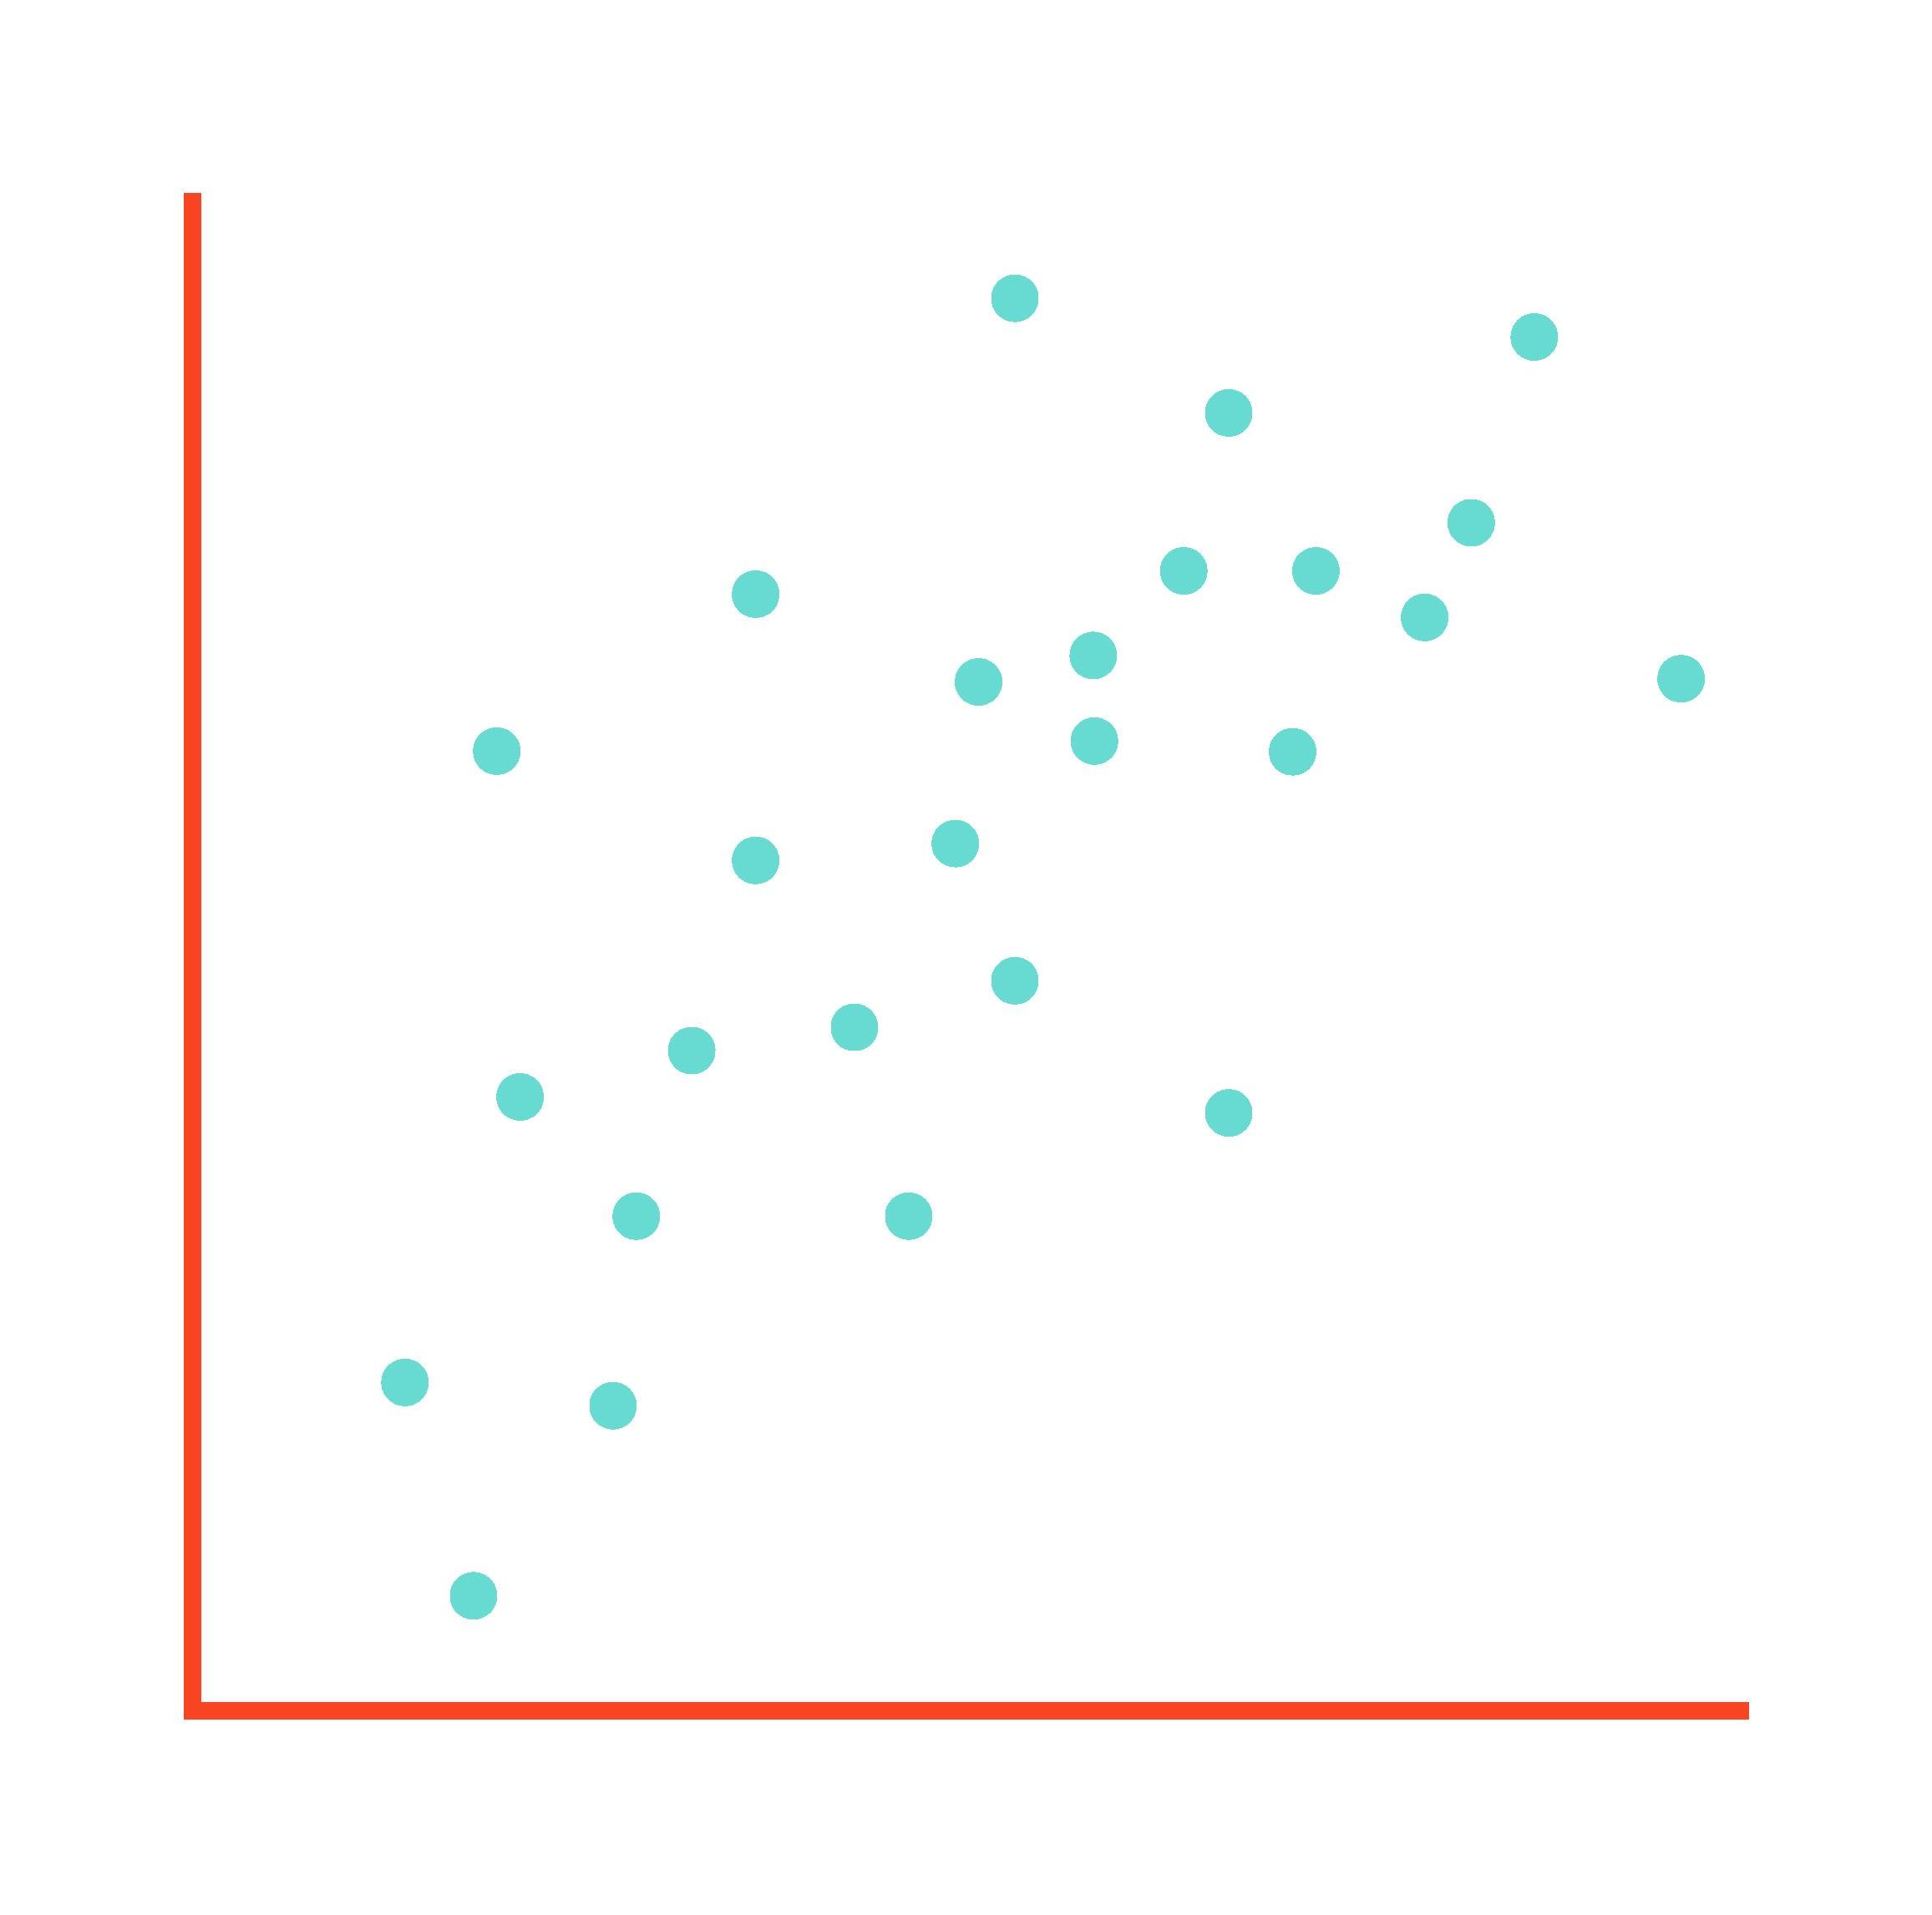 Data Visualization Example Scatterplot chart